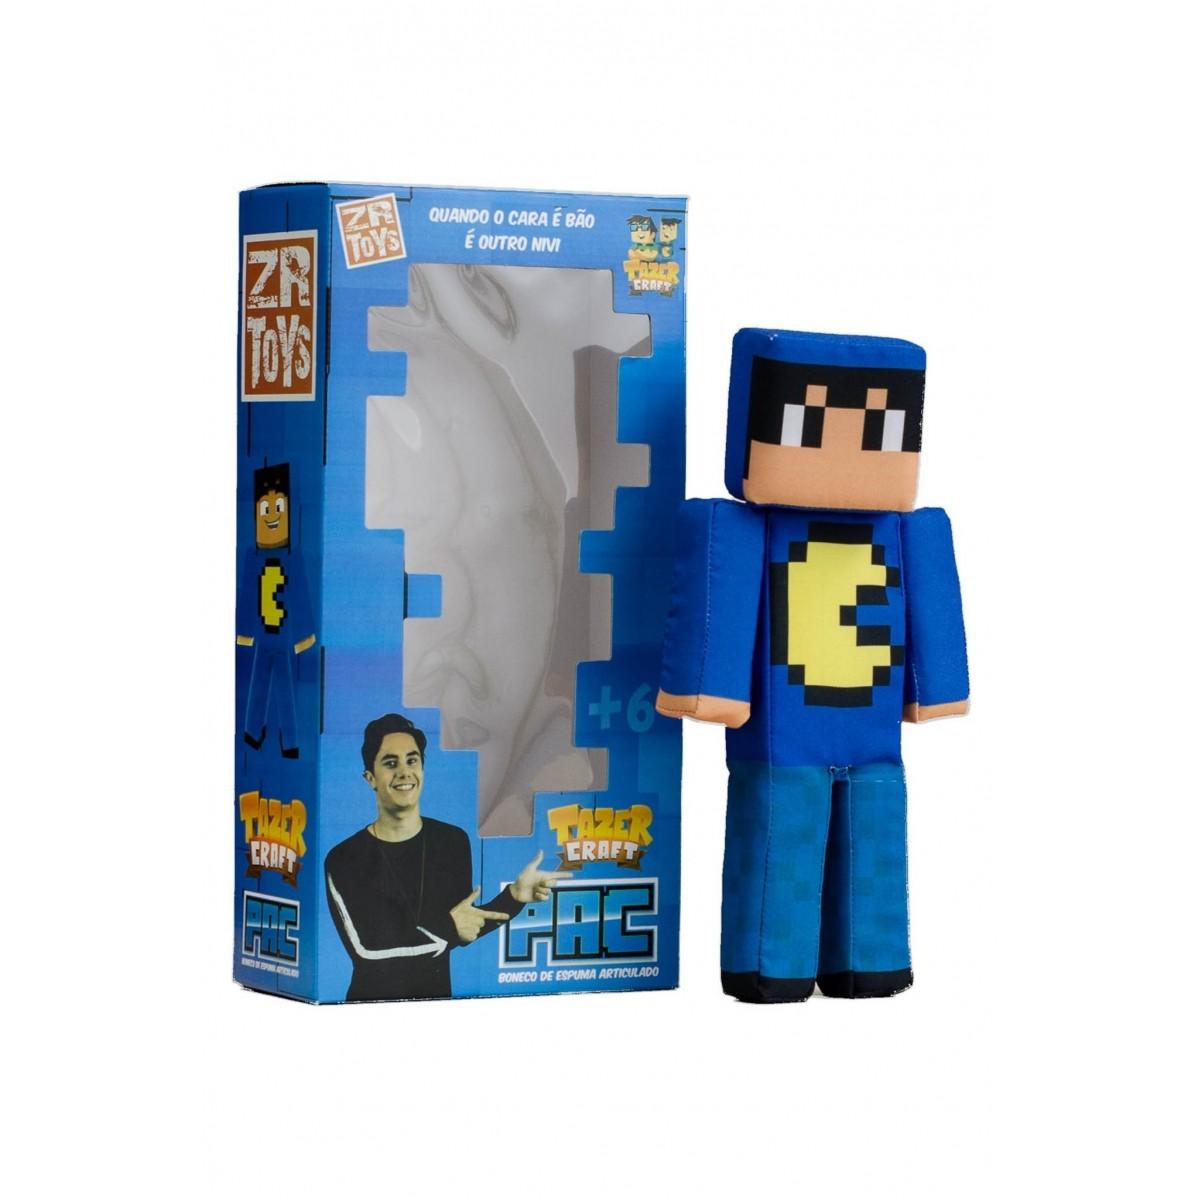 Boneco Tazer Craft Pac ZR Toys C3037  - Place Games